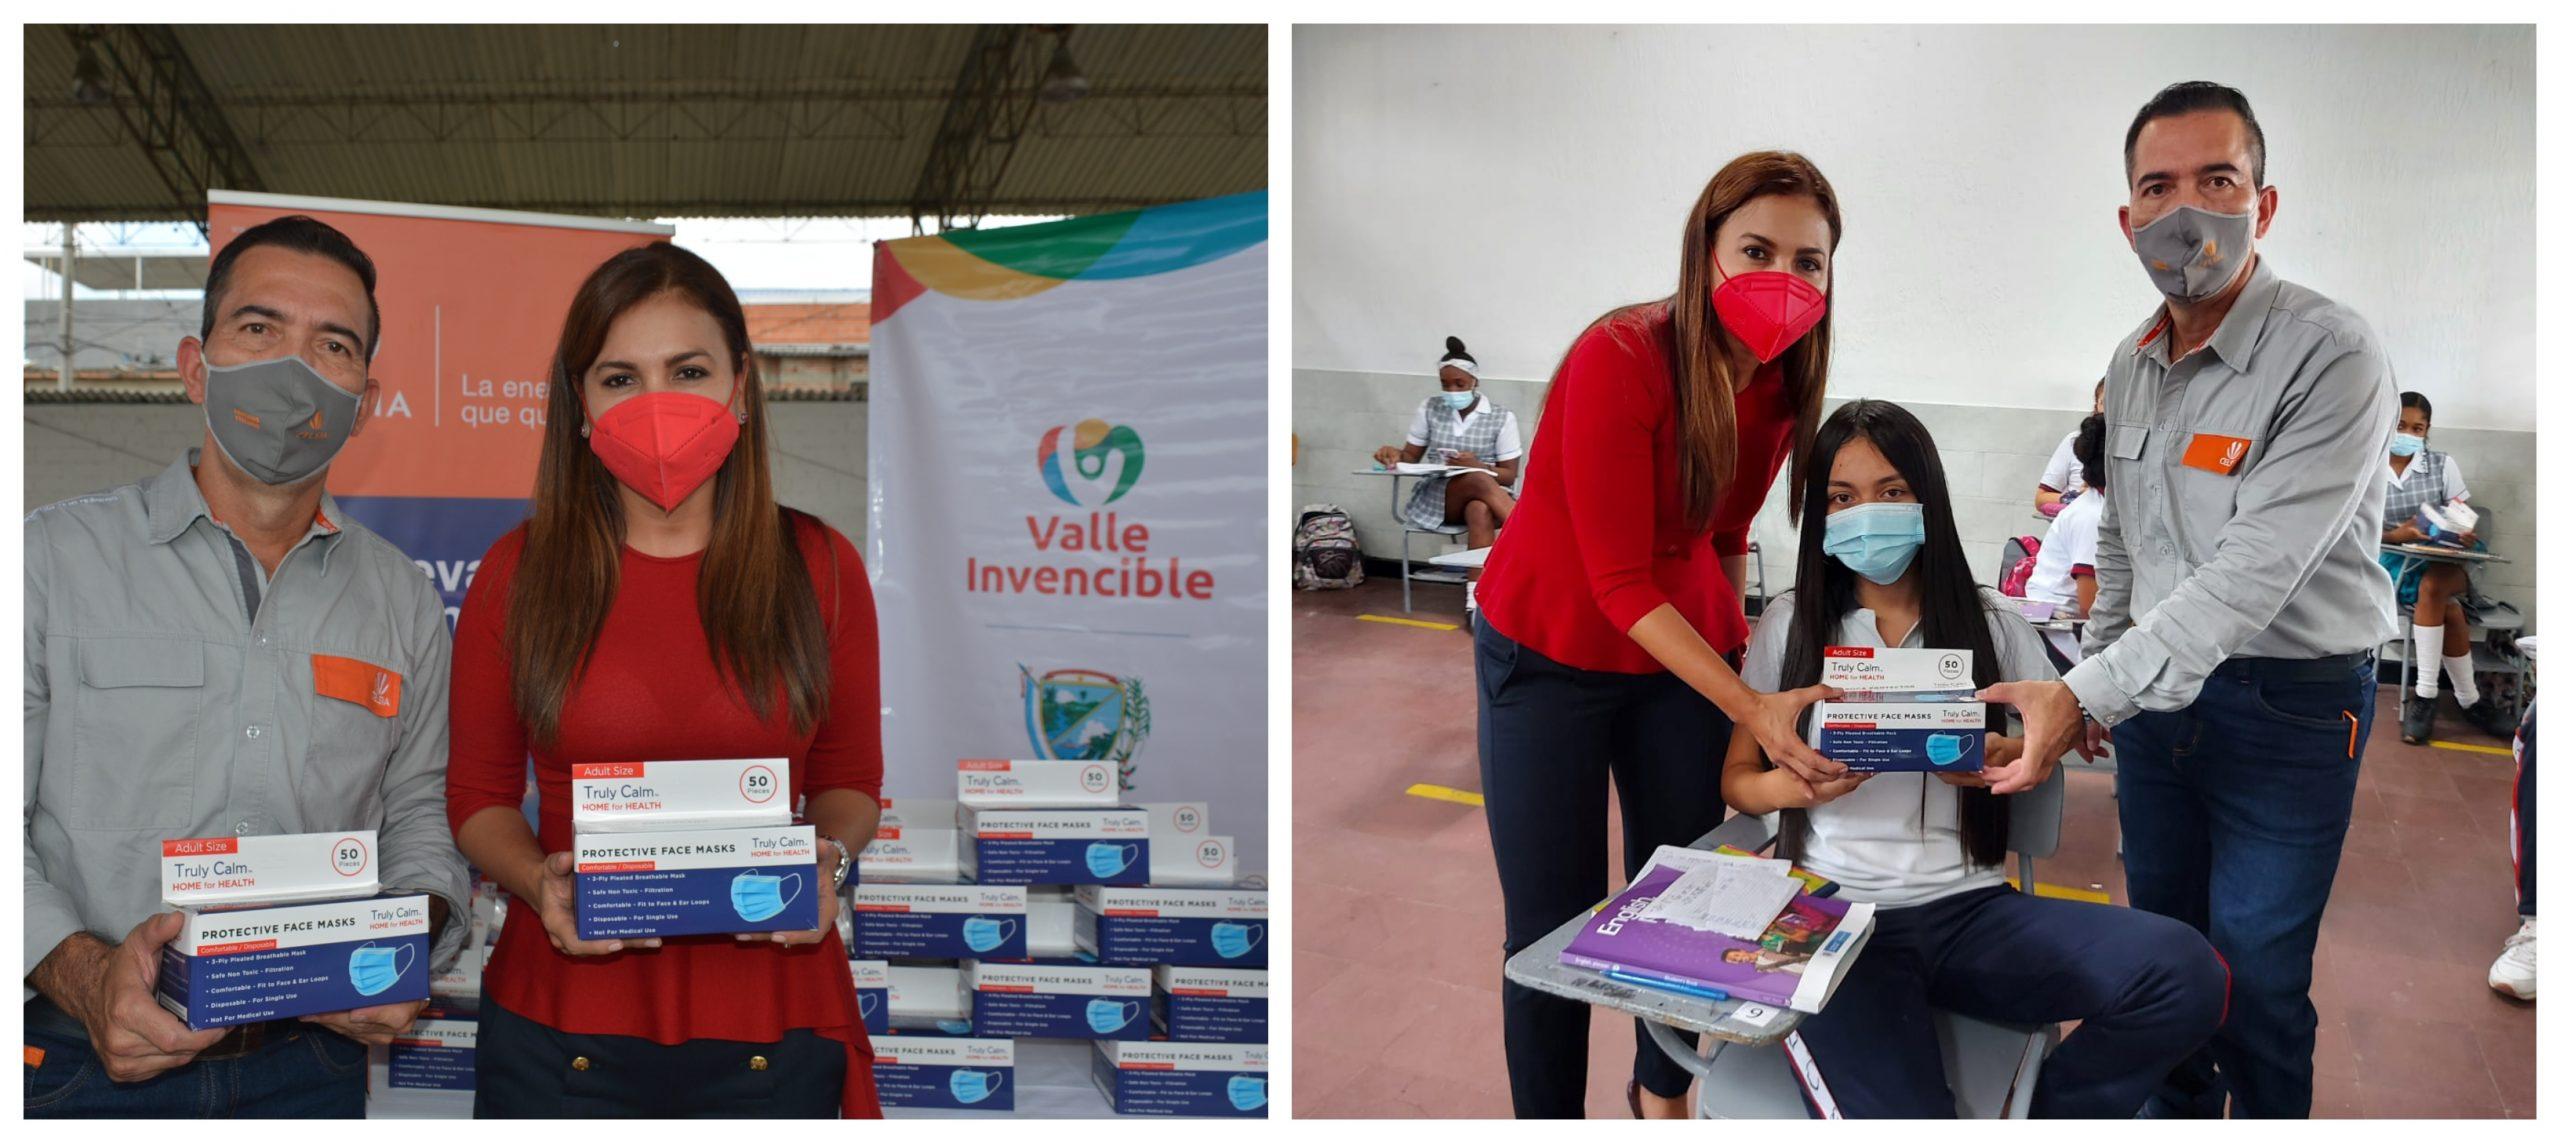 Celsia entrega 681.000 tapabocas a instituciones educativas de 10 municipios del Valle